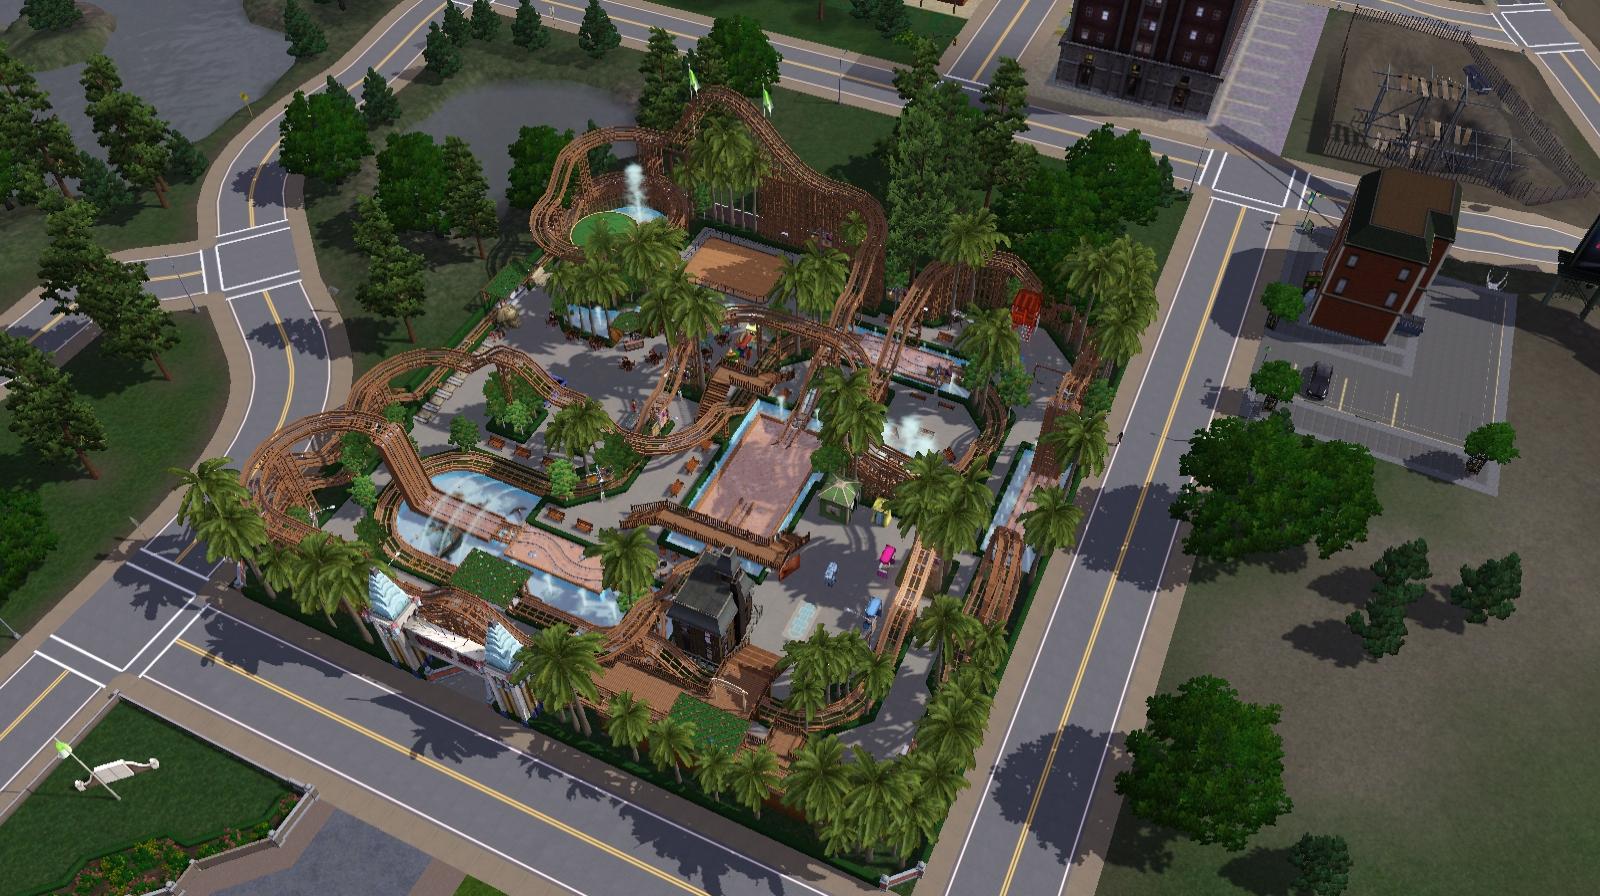 [Descarga] Parque Adventure Park. Screenshot-44